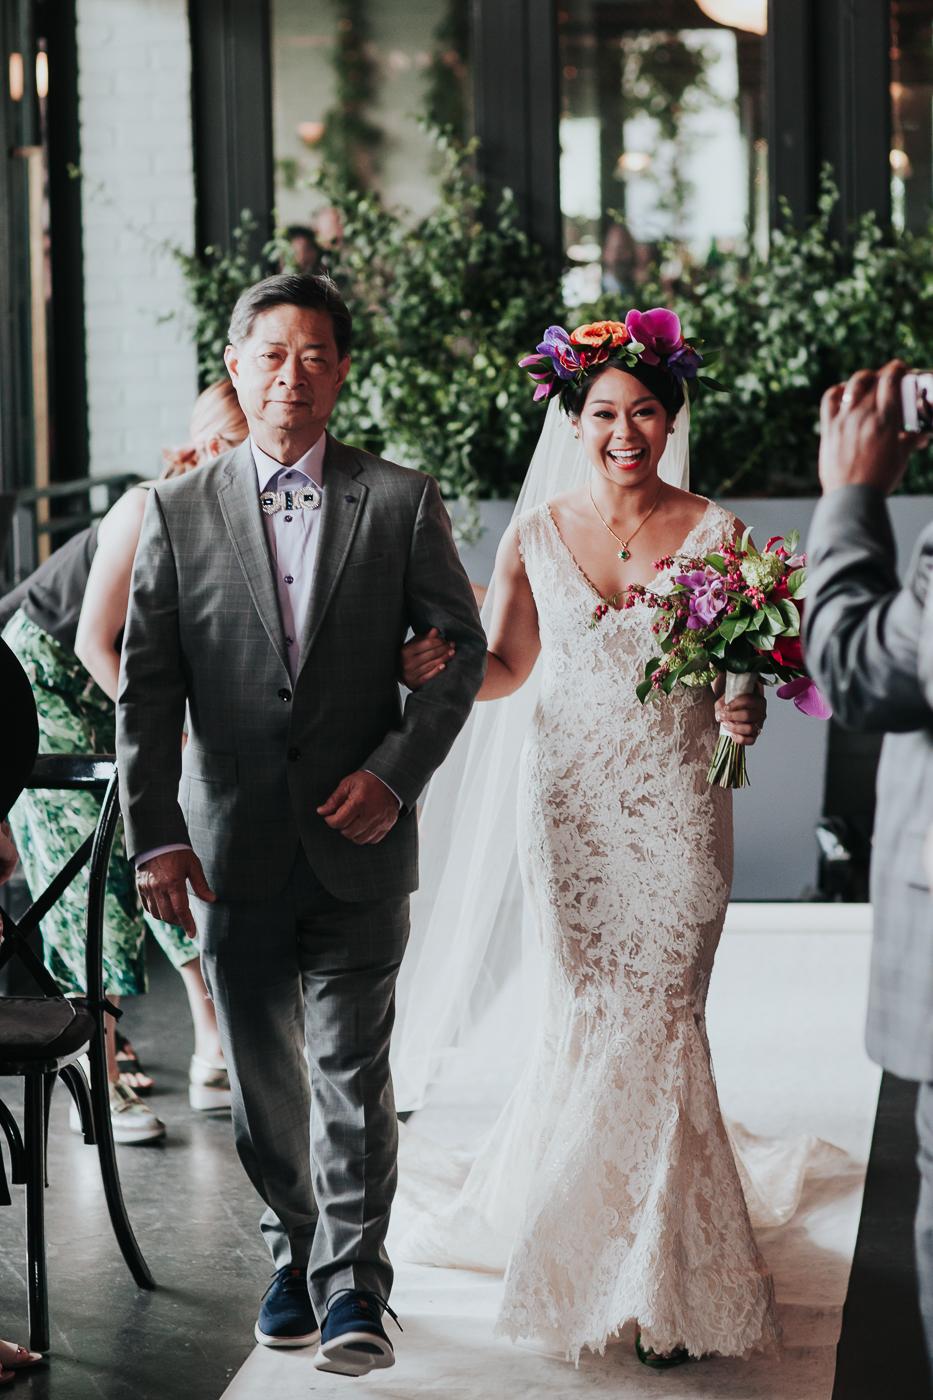 501-Union-Brooklyn-Documentary-Wedding-Photographer-65.jpg